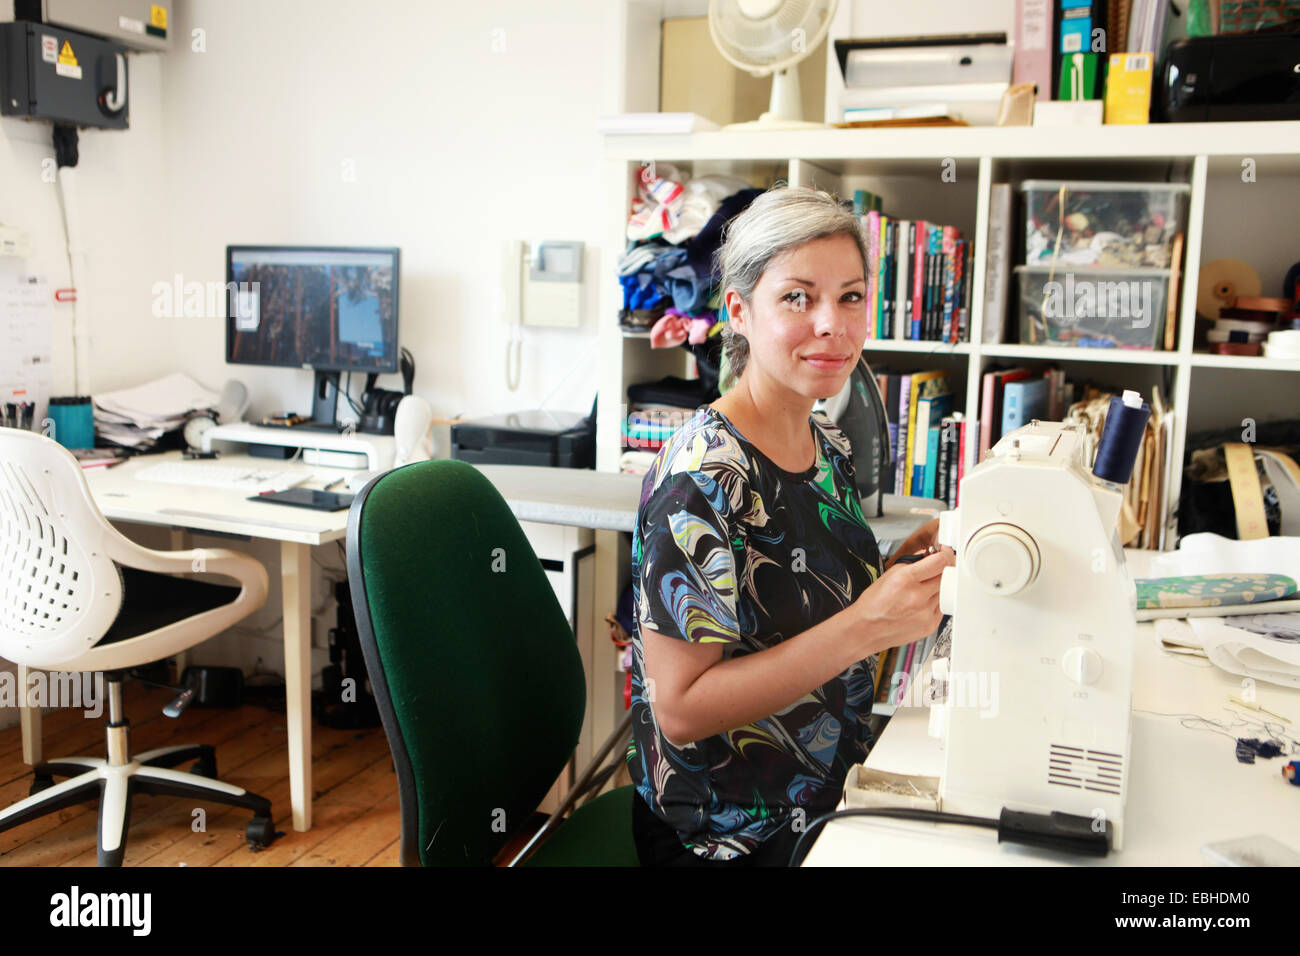 Diseñador que trabaja a máquina de coser en studio Imagen De Stock